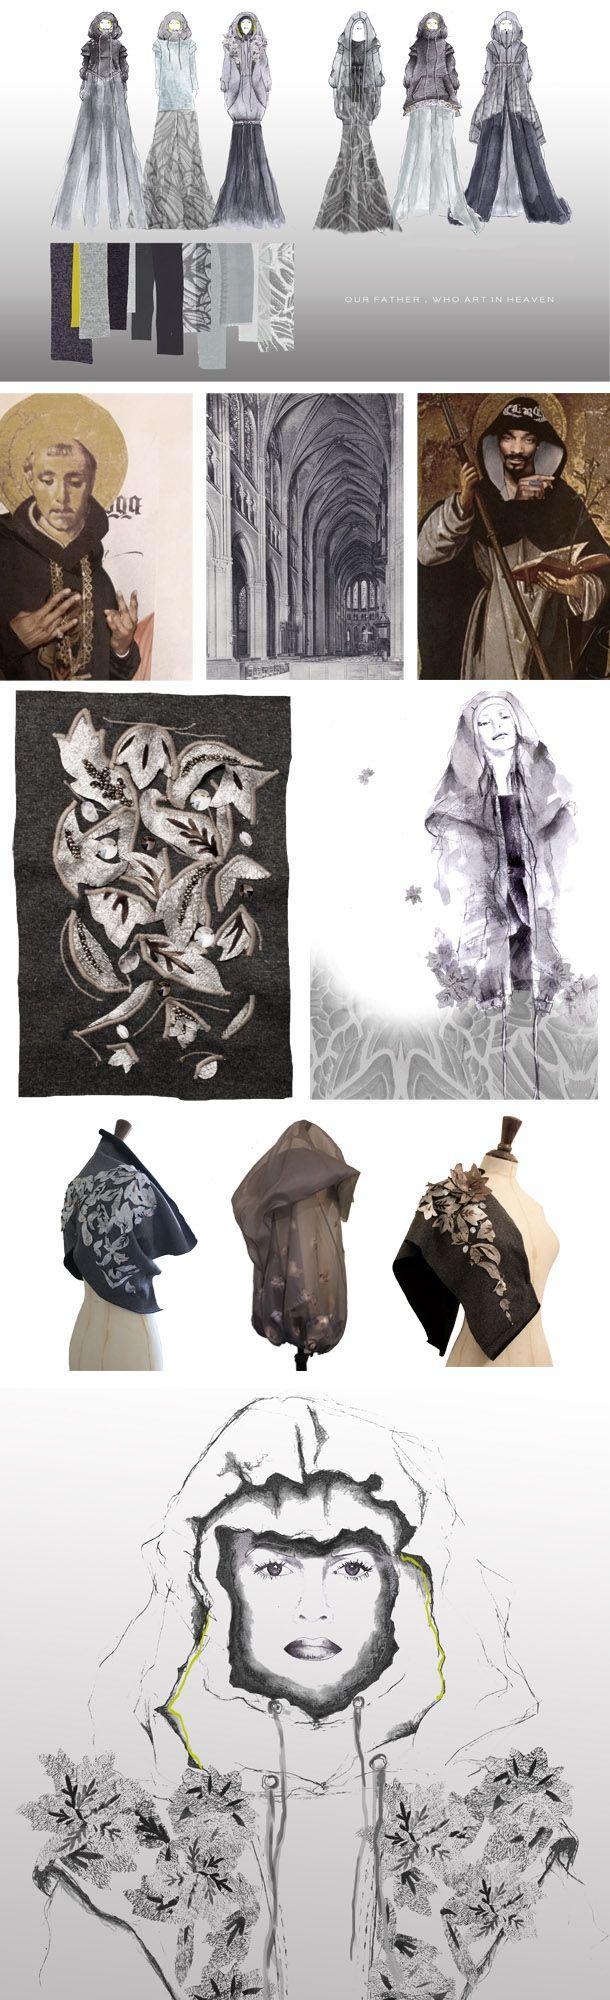 "Fashion design & development of final collection - architecture, religion & culture - the fashion sketchbook; fashion portfolio // Chloe Jones, ""Our Father, who art in Heaven"""